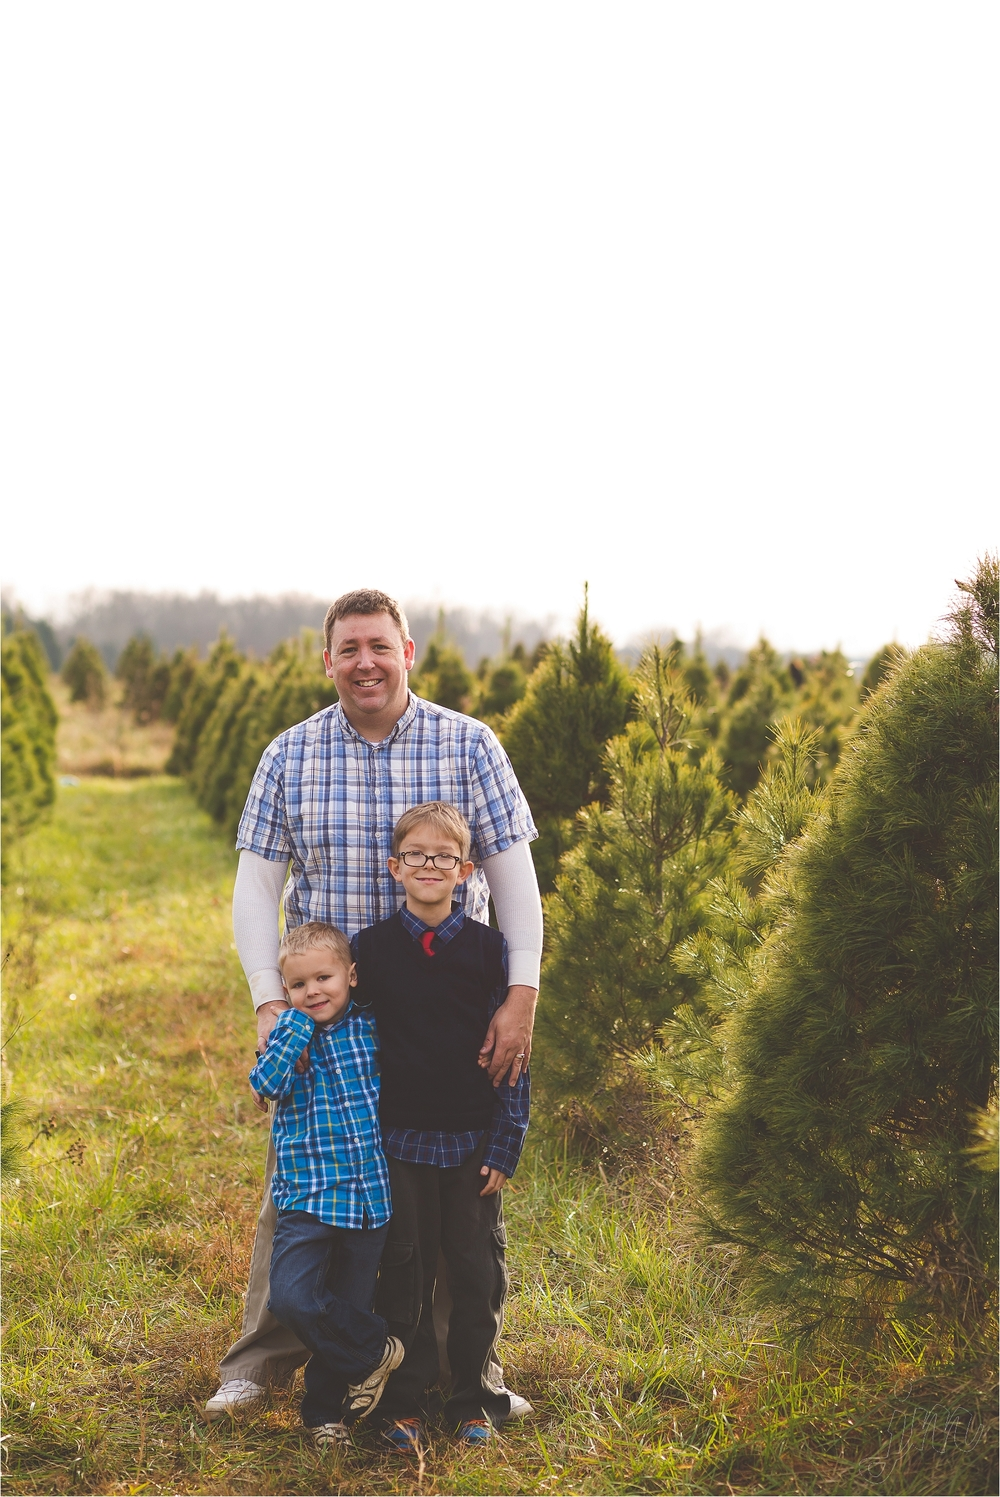 christmas-tree-farm-session-pnw-jannicka-mayte_0013.jpg